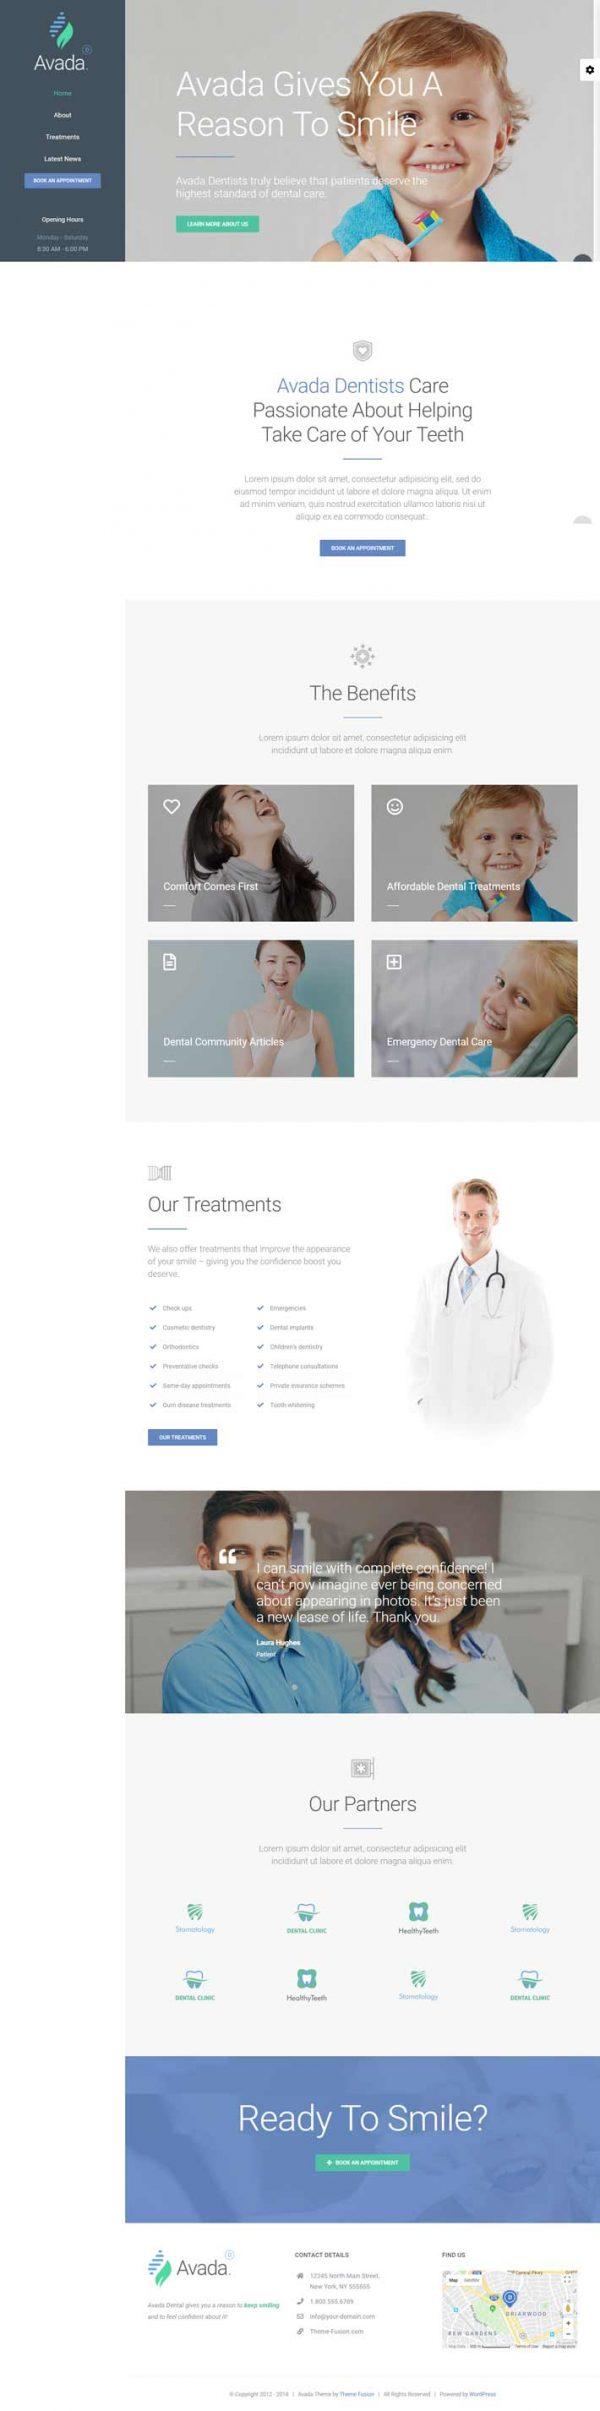 Avada-Dental-Clinic